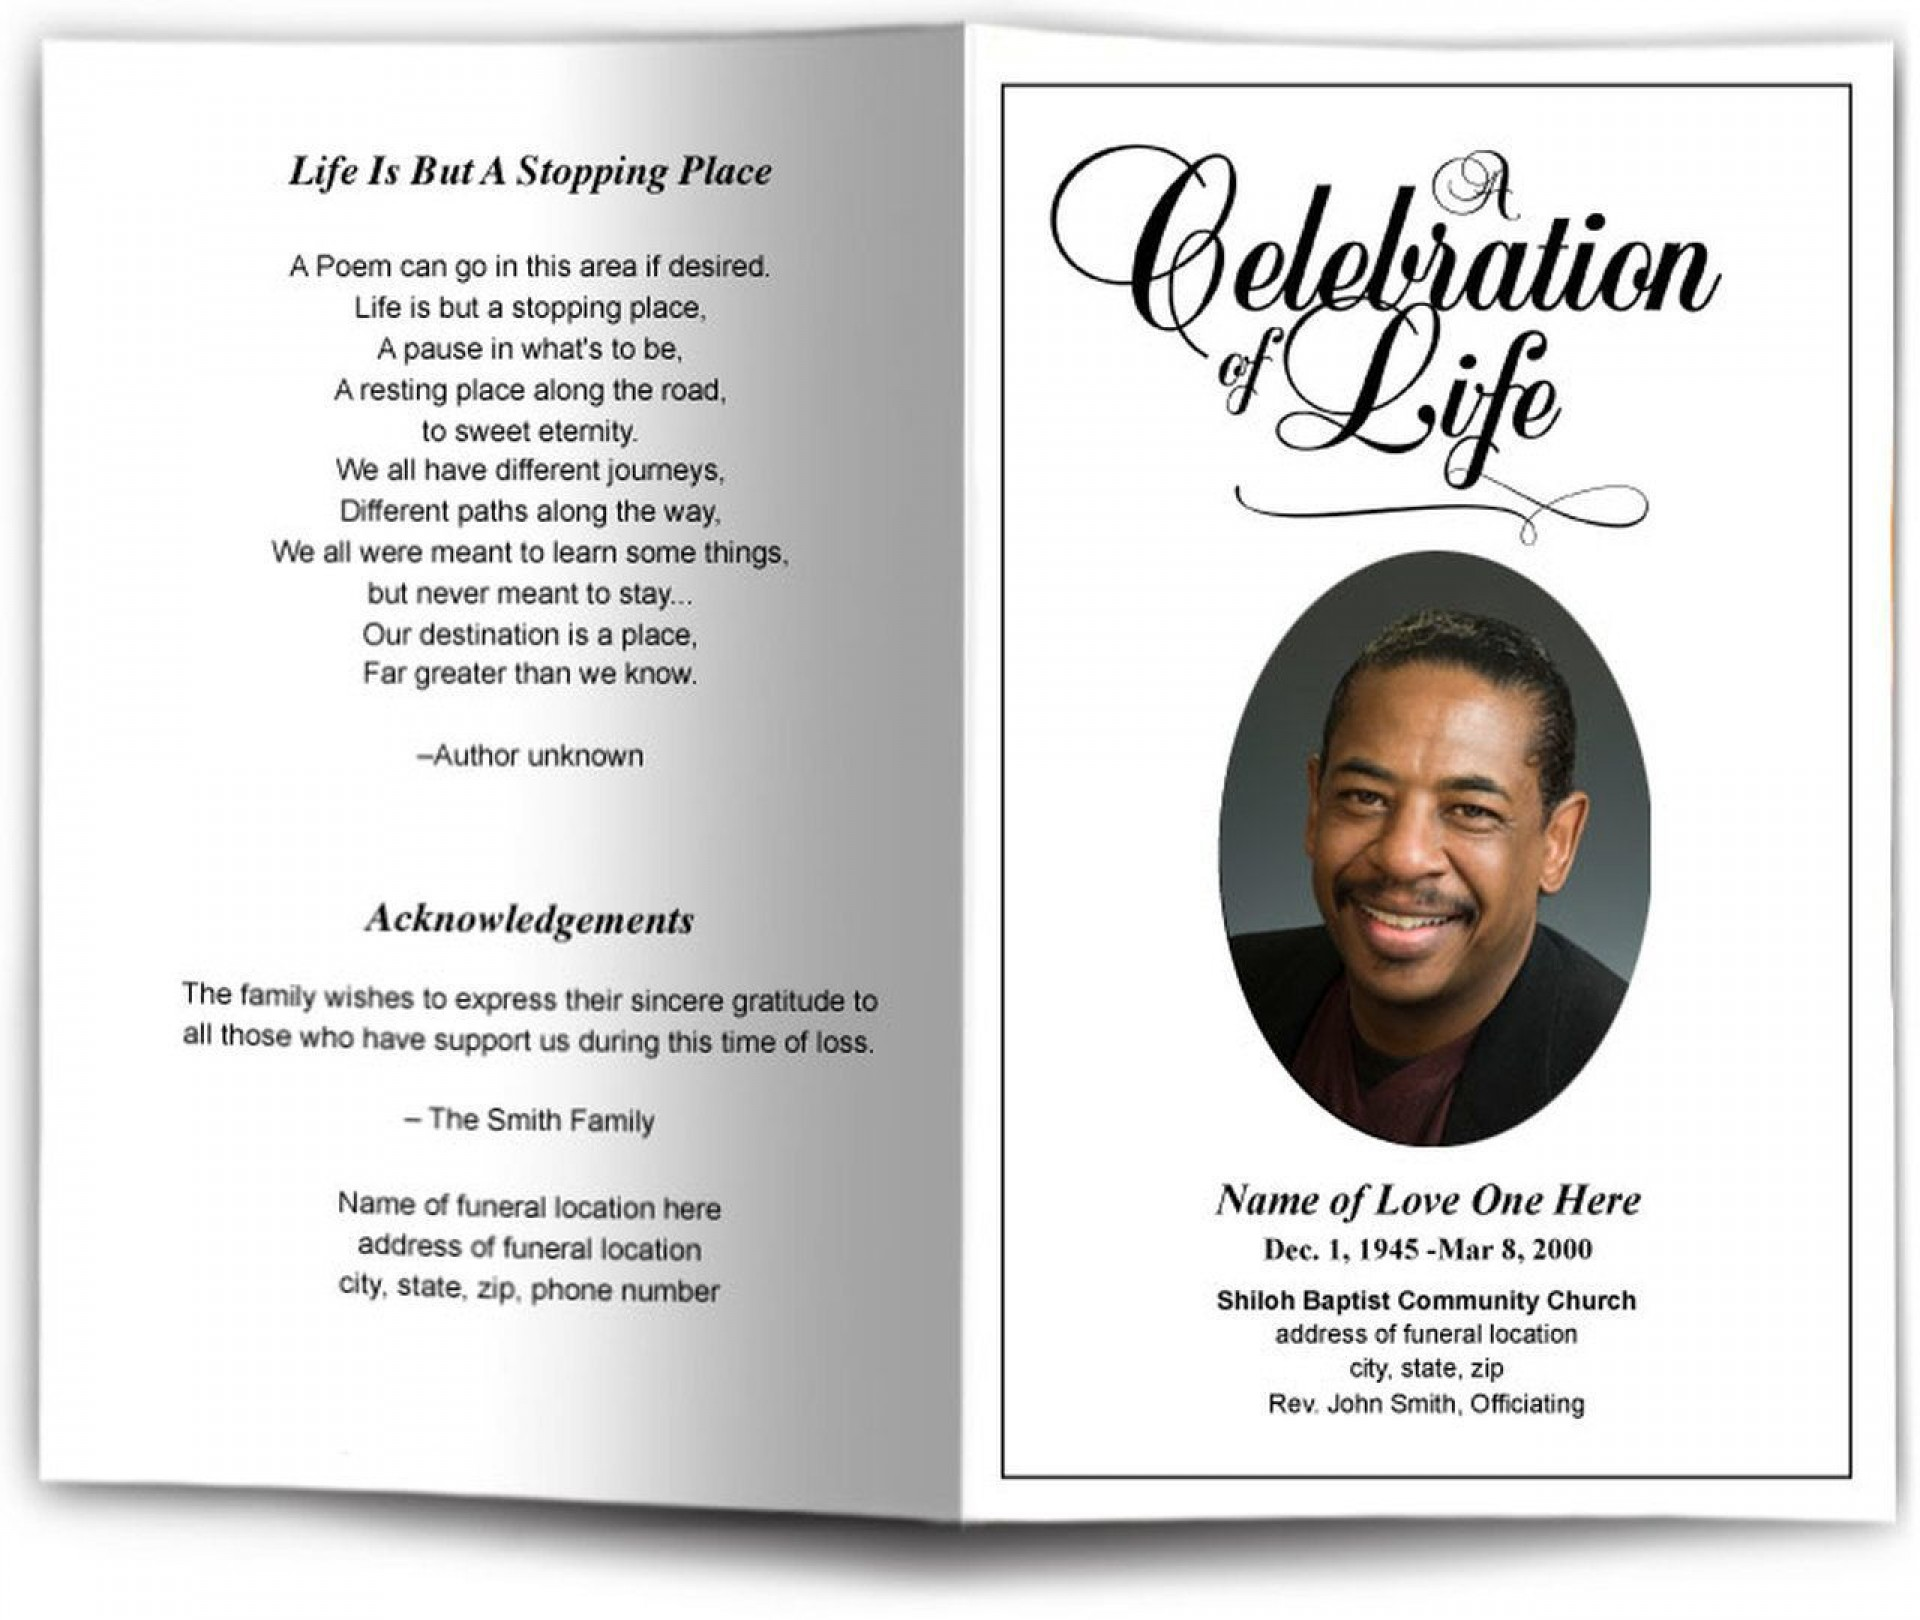 000 Sensational Free Funeral Program Template High Def  Word Catholic Editable Pdf1920